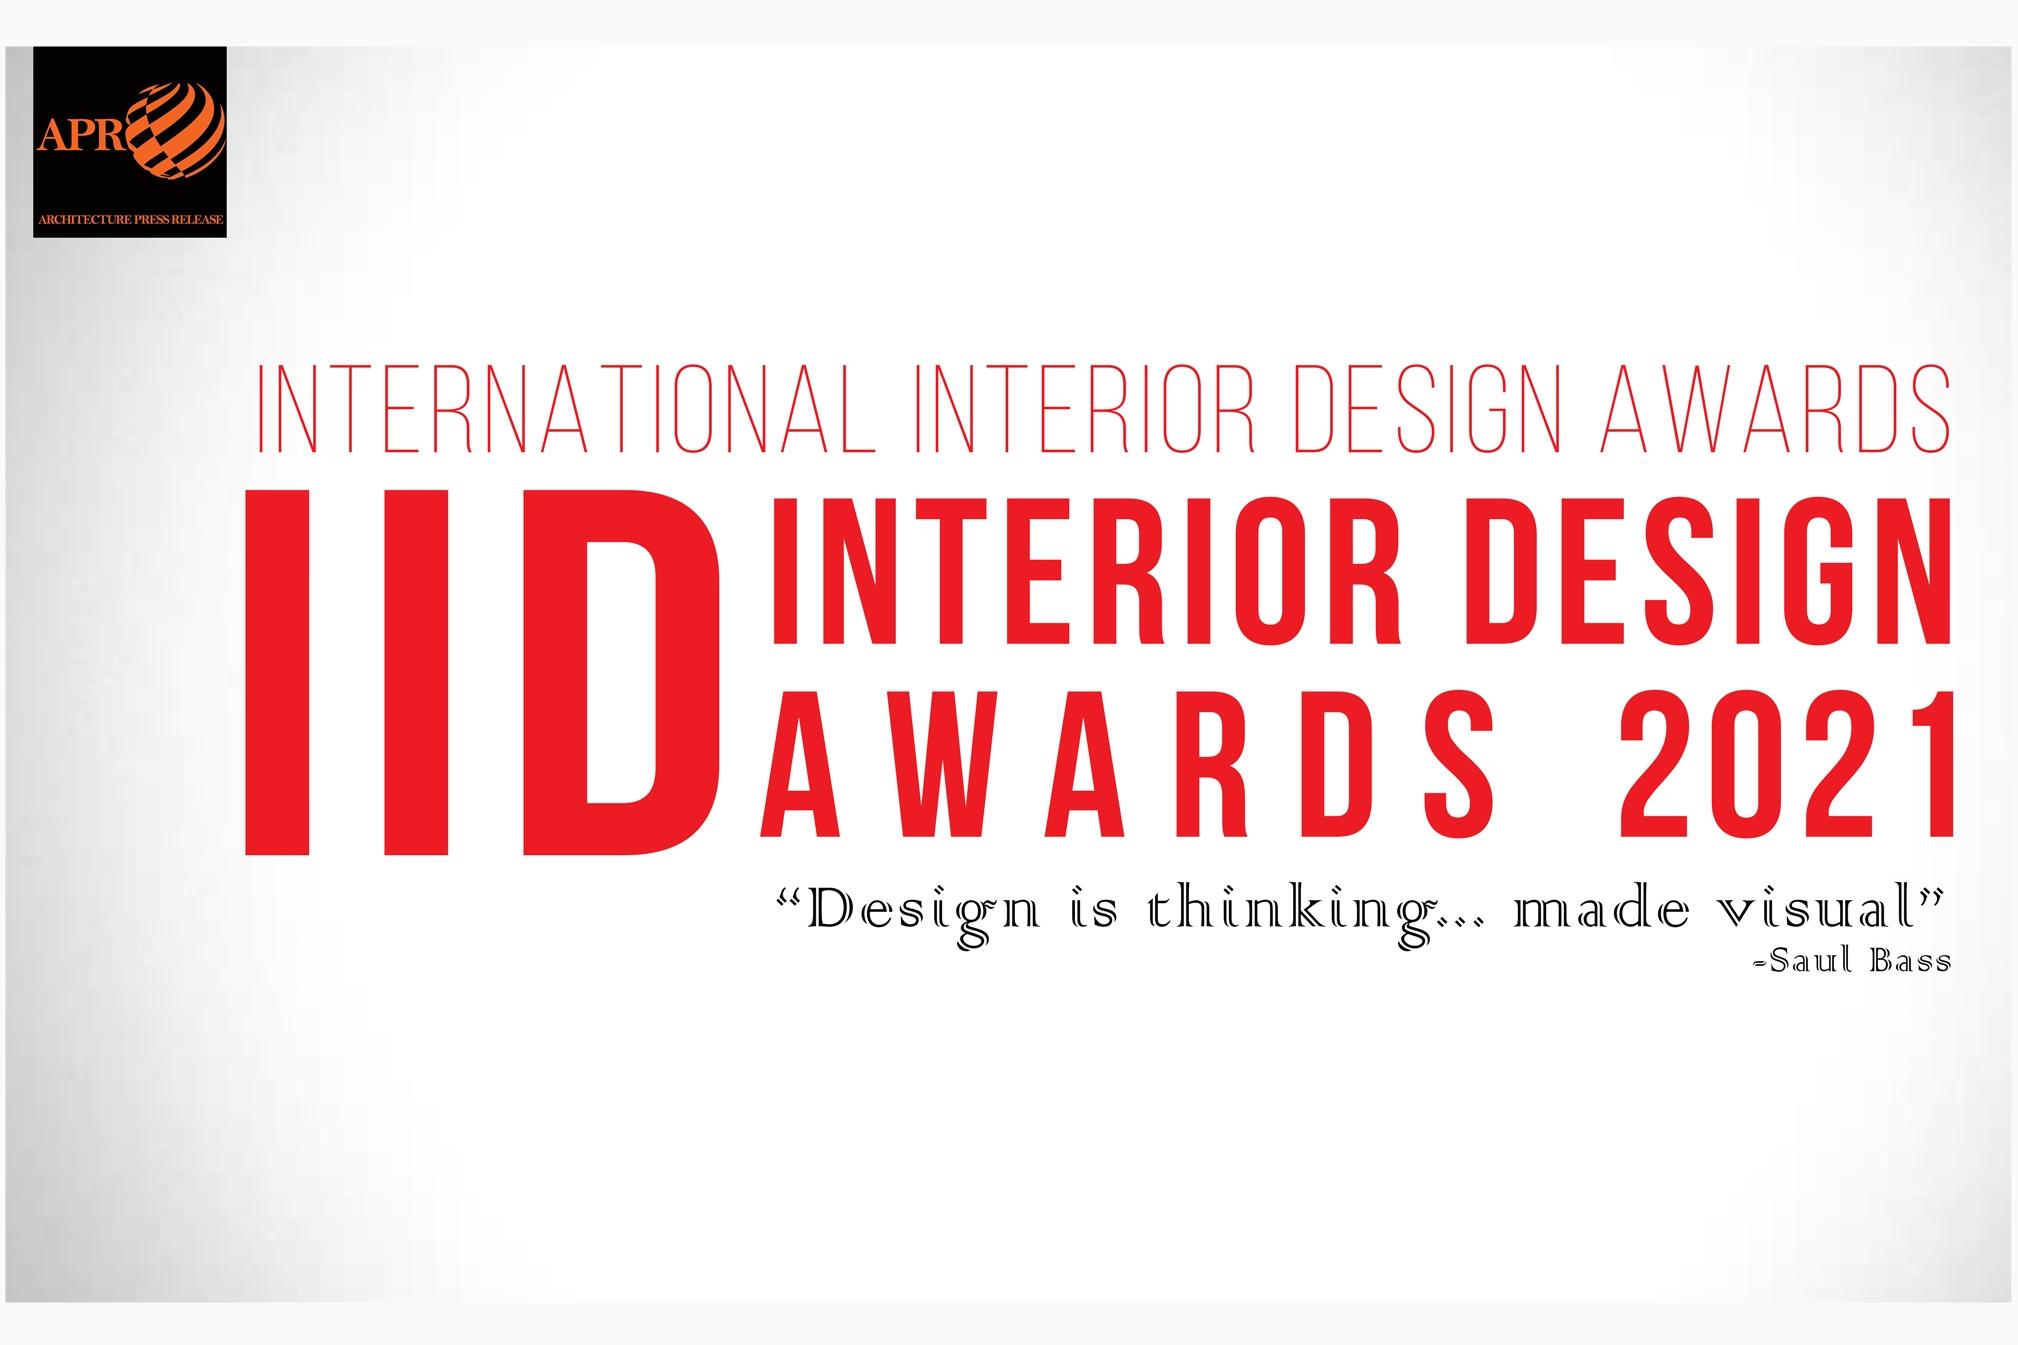 International Interior Design Awards 2021 (IIDA)